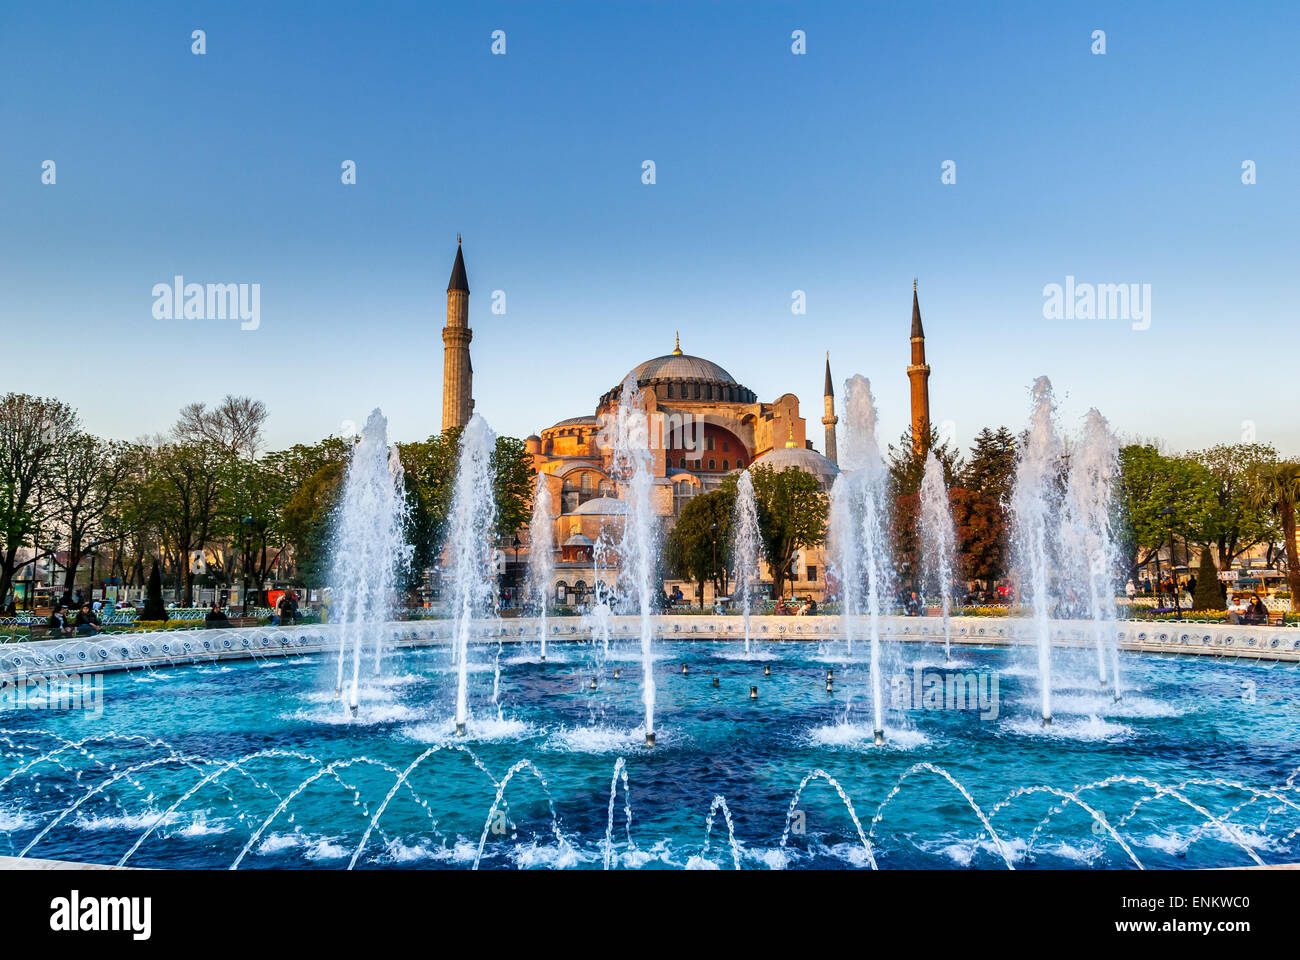 Hagia Sophia Moschee In Sultanahmet-Platz, Istanbul, Türkei. Hagia Sophia Museum Istanbul Türkei Stockbild